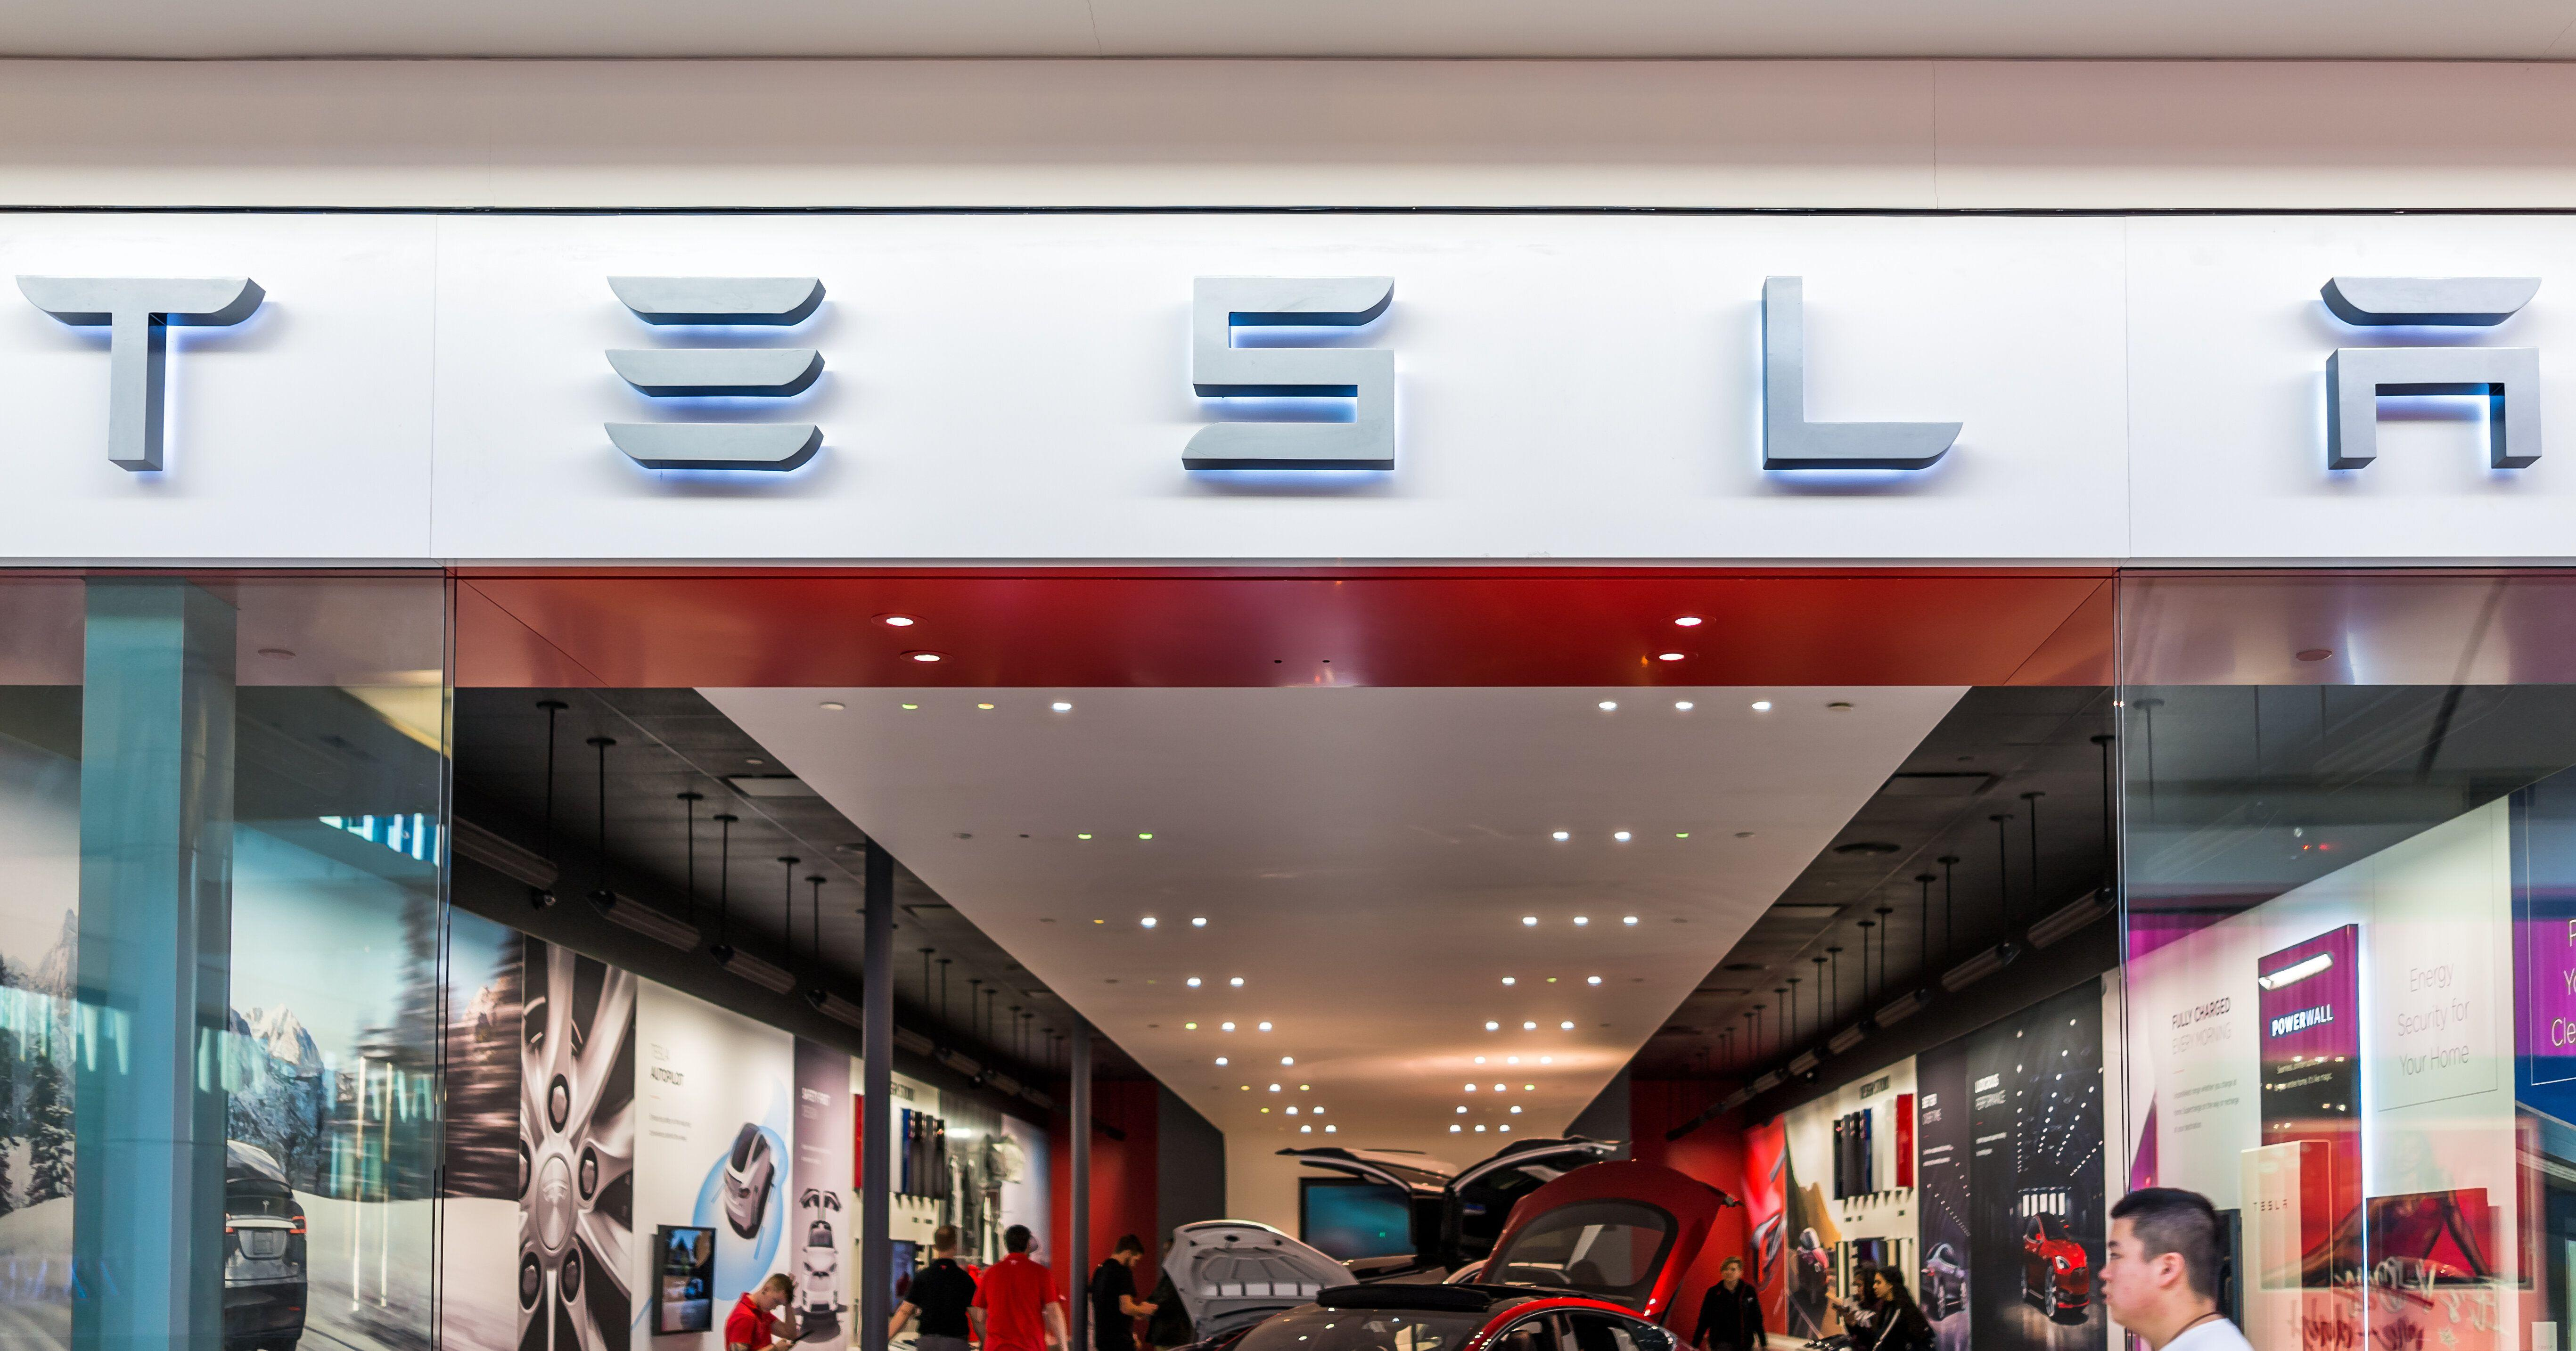 Tesla's chances of hitting its profit goal: 'An uphill battle'